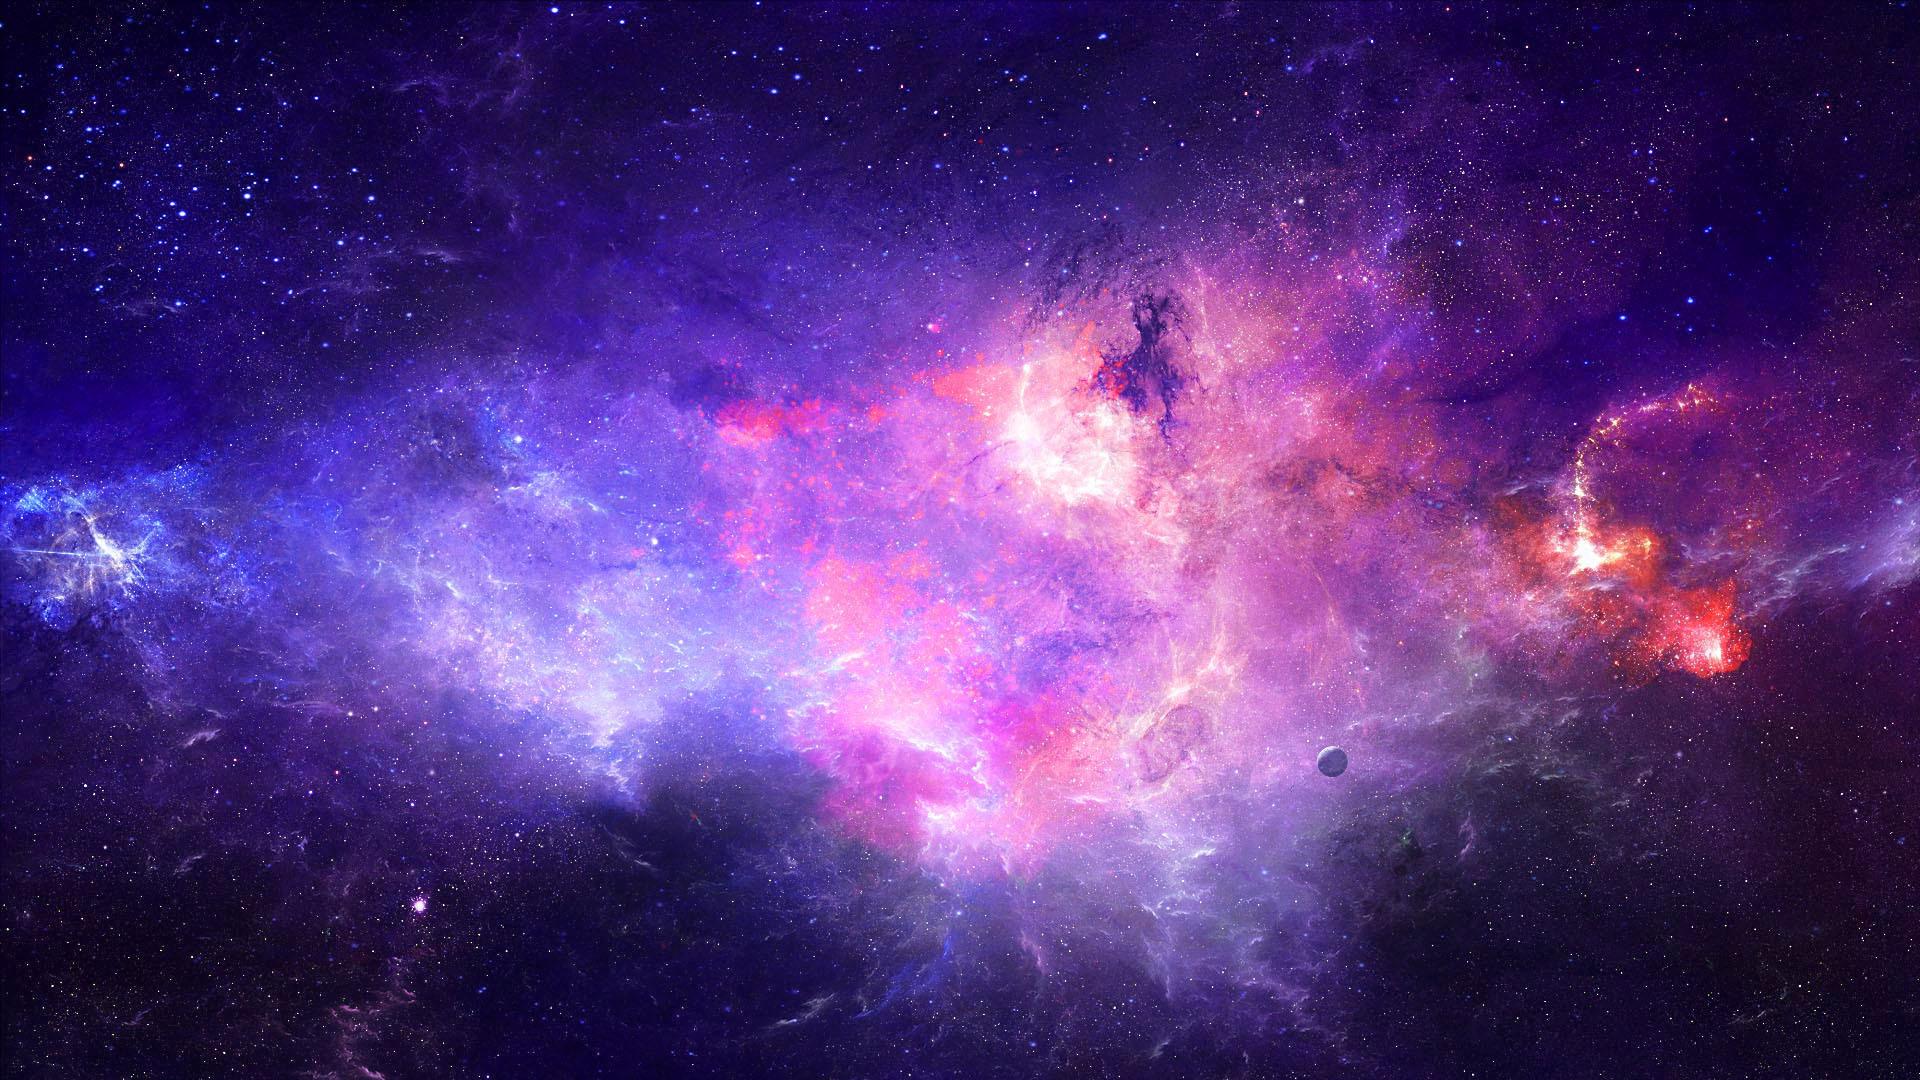 Nebula Full HD Wallpaper and Background | 1920x1080 | ID ...